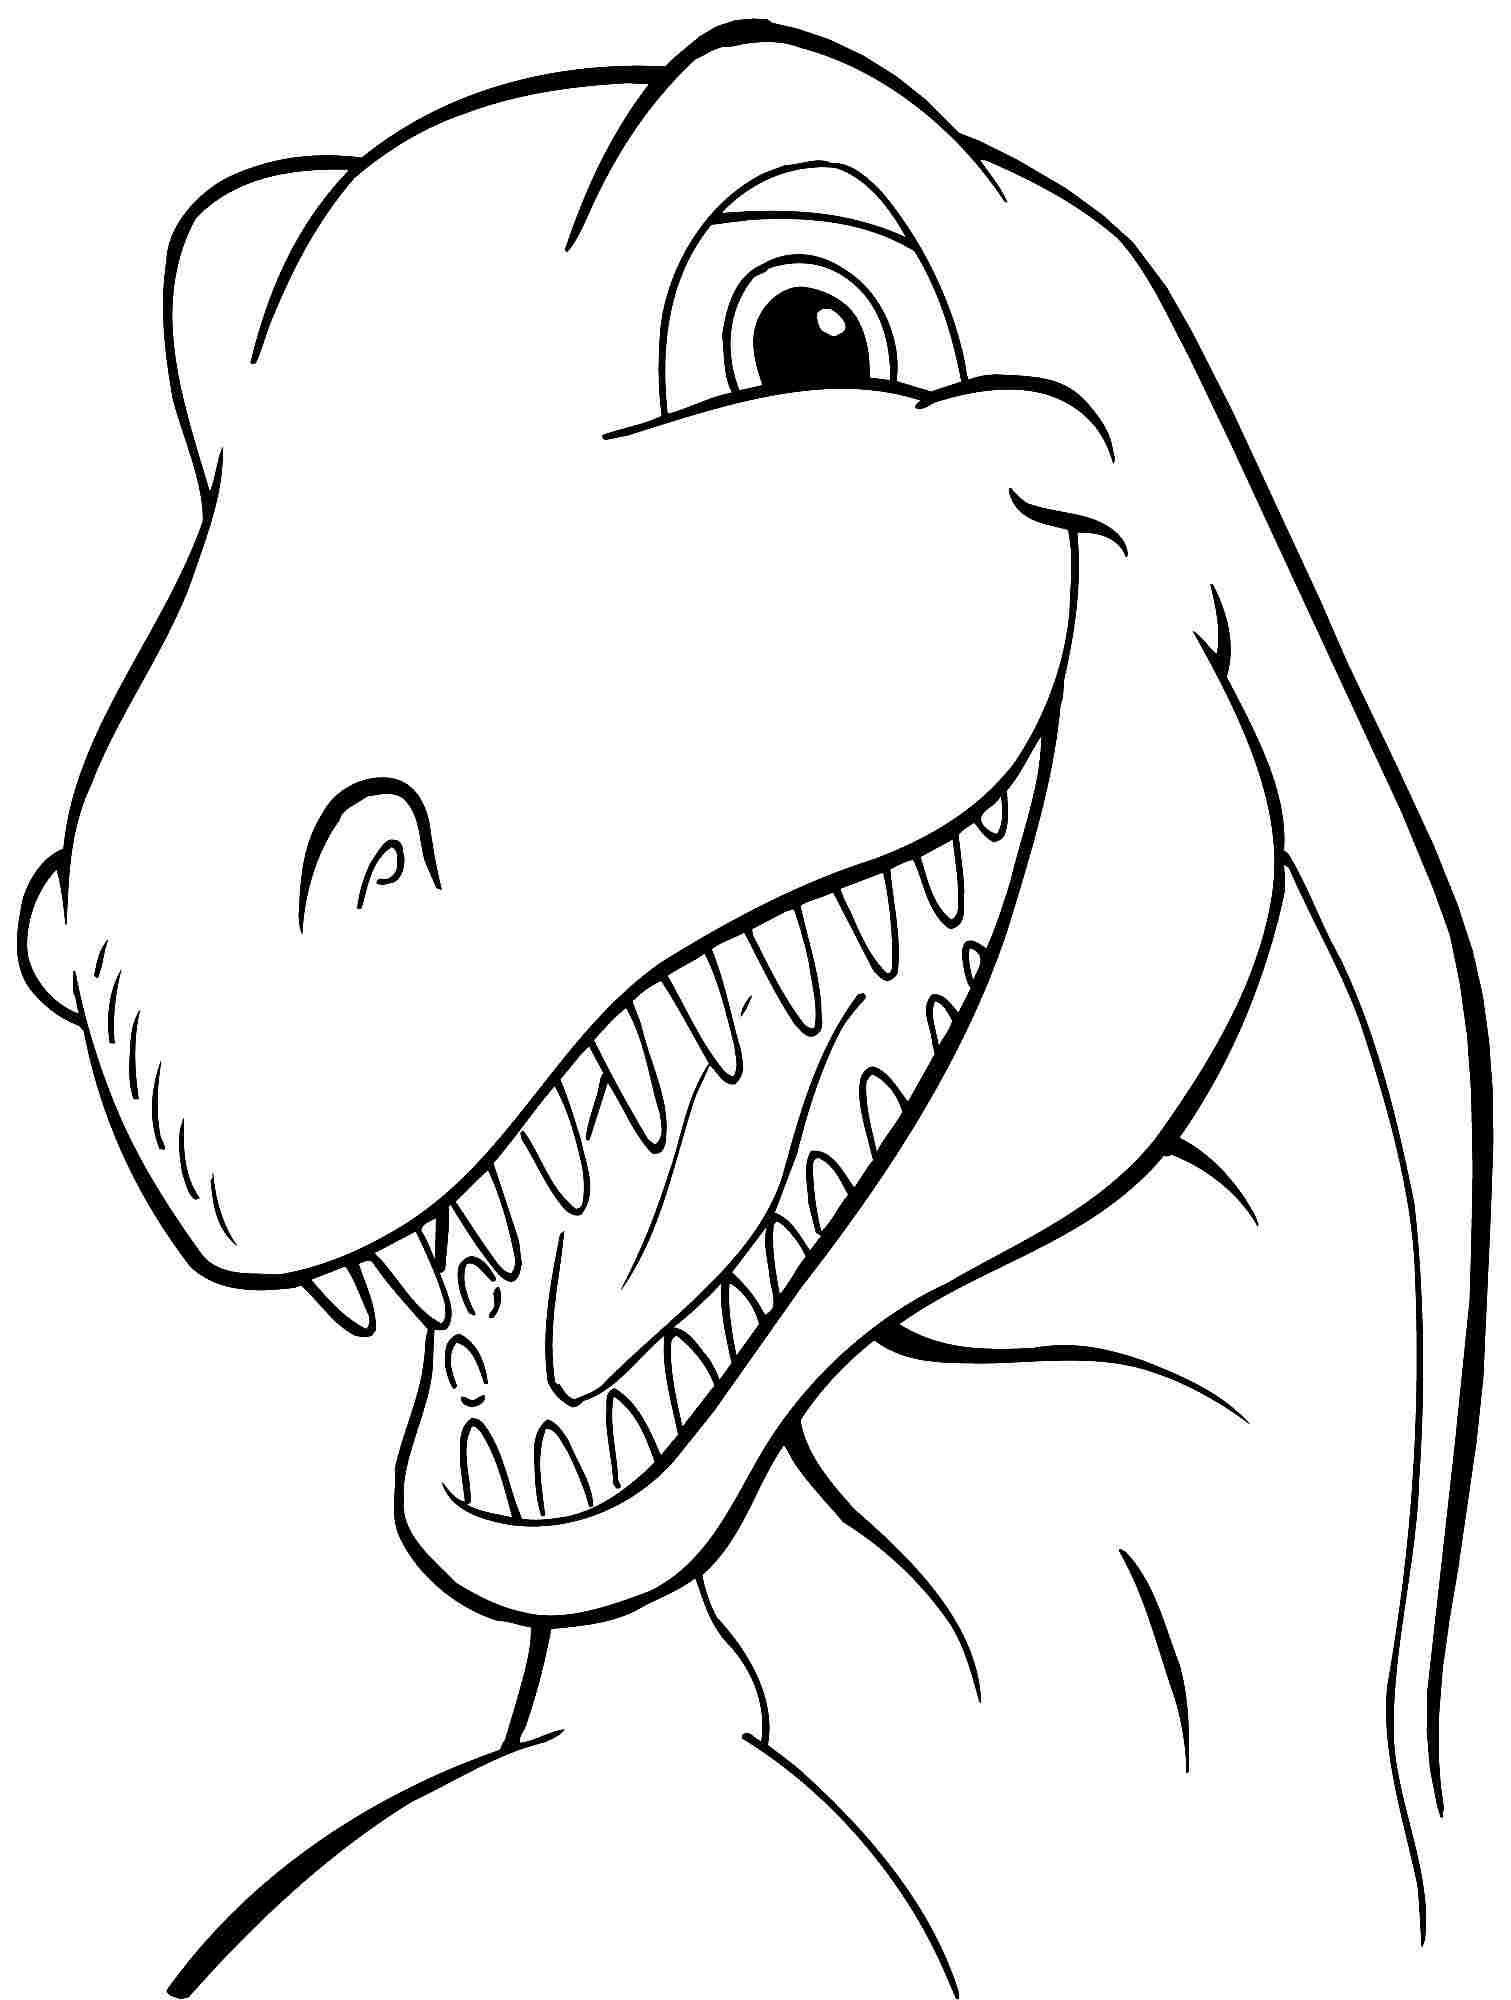 Animal Dinosaurs Tyrannosaurus Rex Coloring Sheets Free Printable For Kids Girls 22167 Dinosaur Coloring Pages Dinosaur Coloring Sheets Dinosaur Coloring